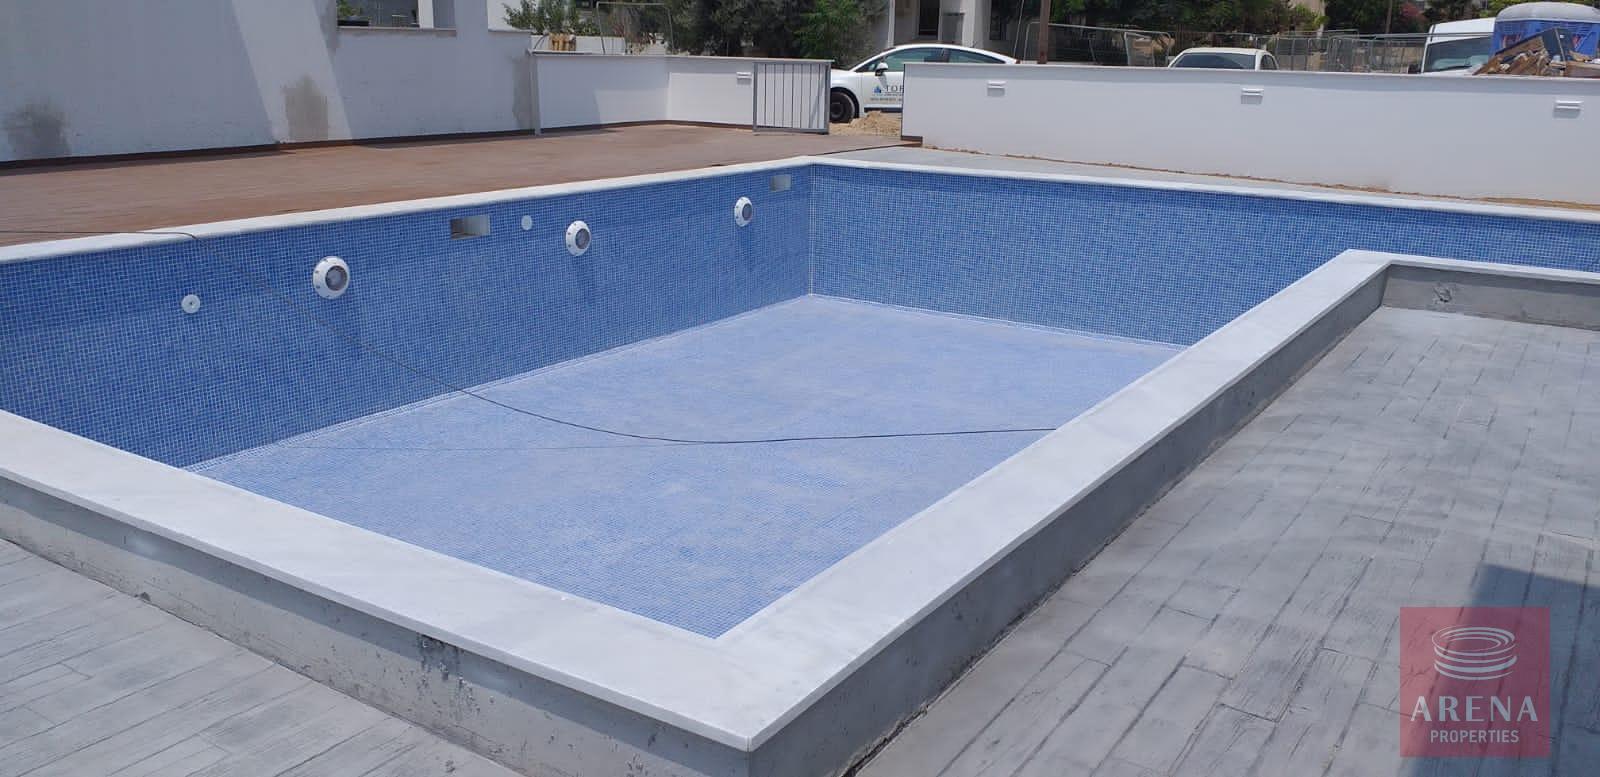 Apartment in Livadia - communal pool